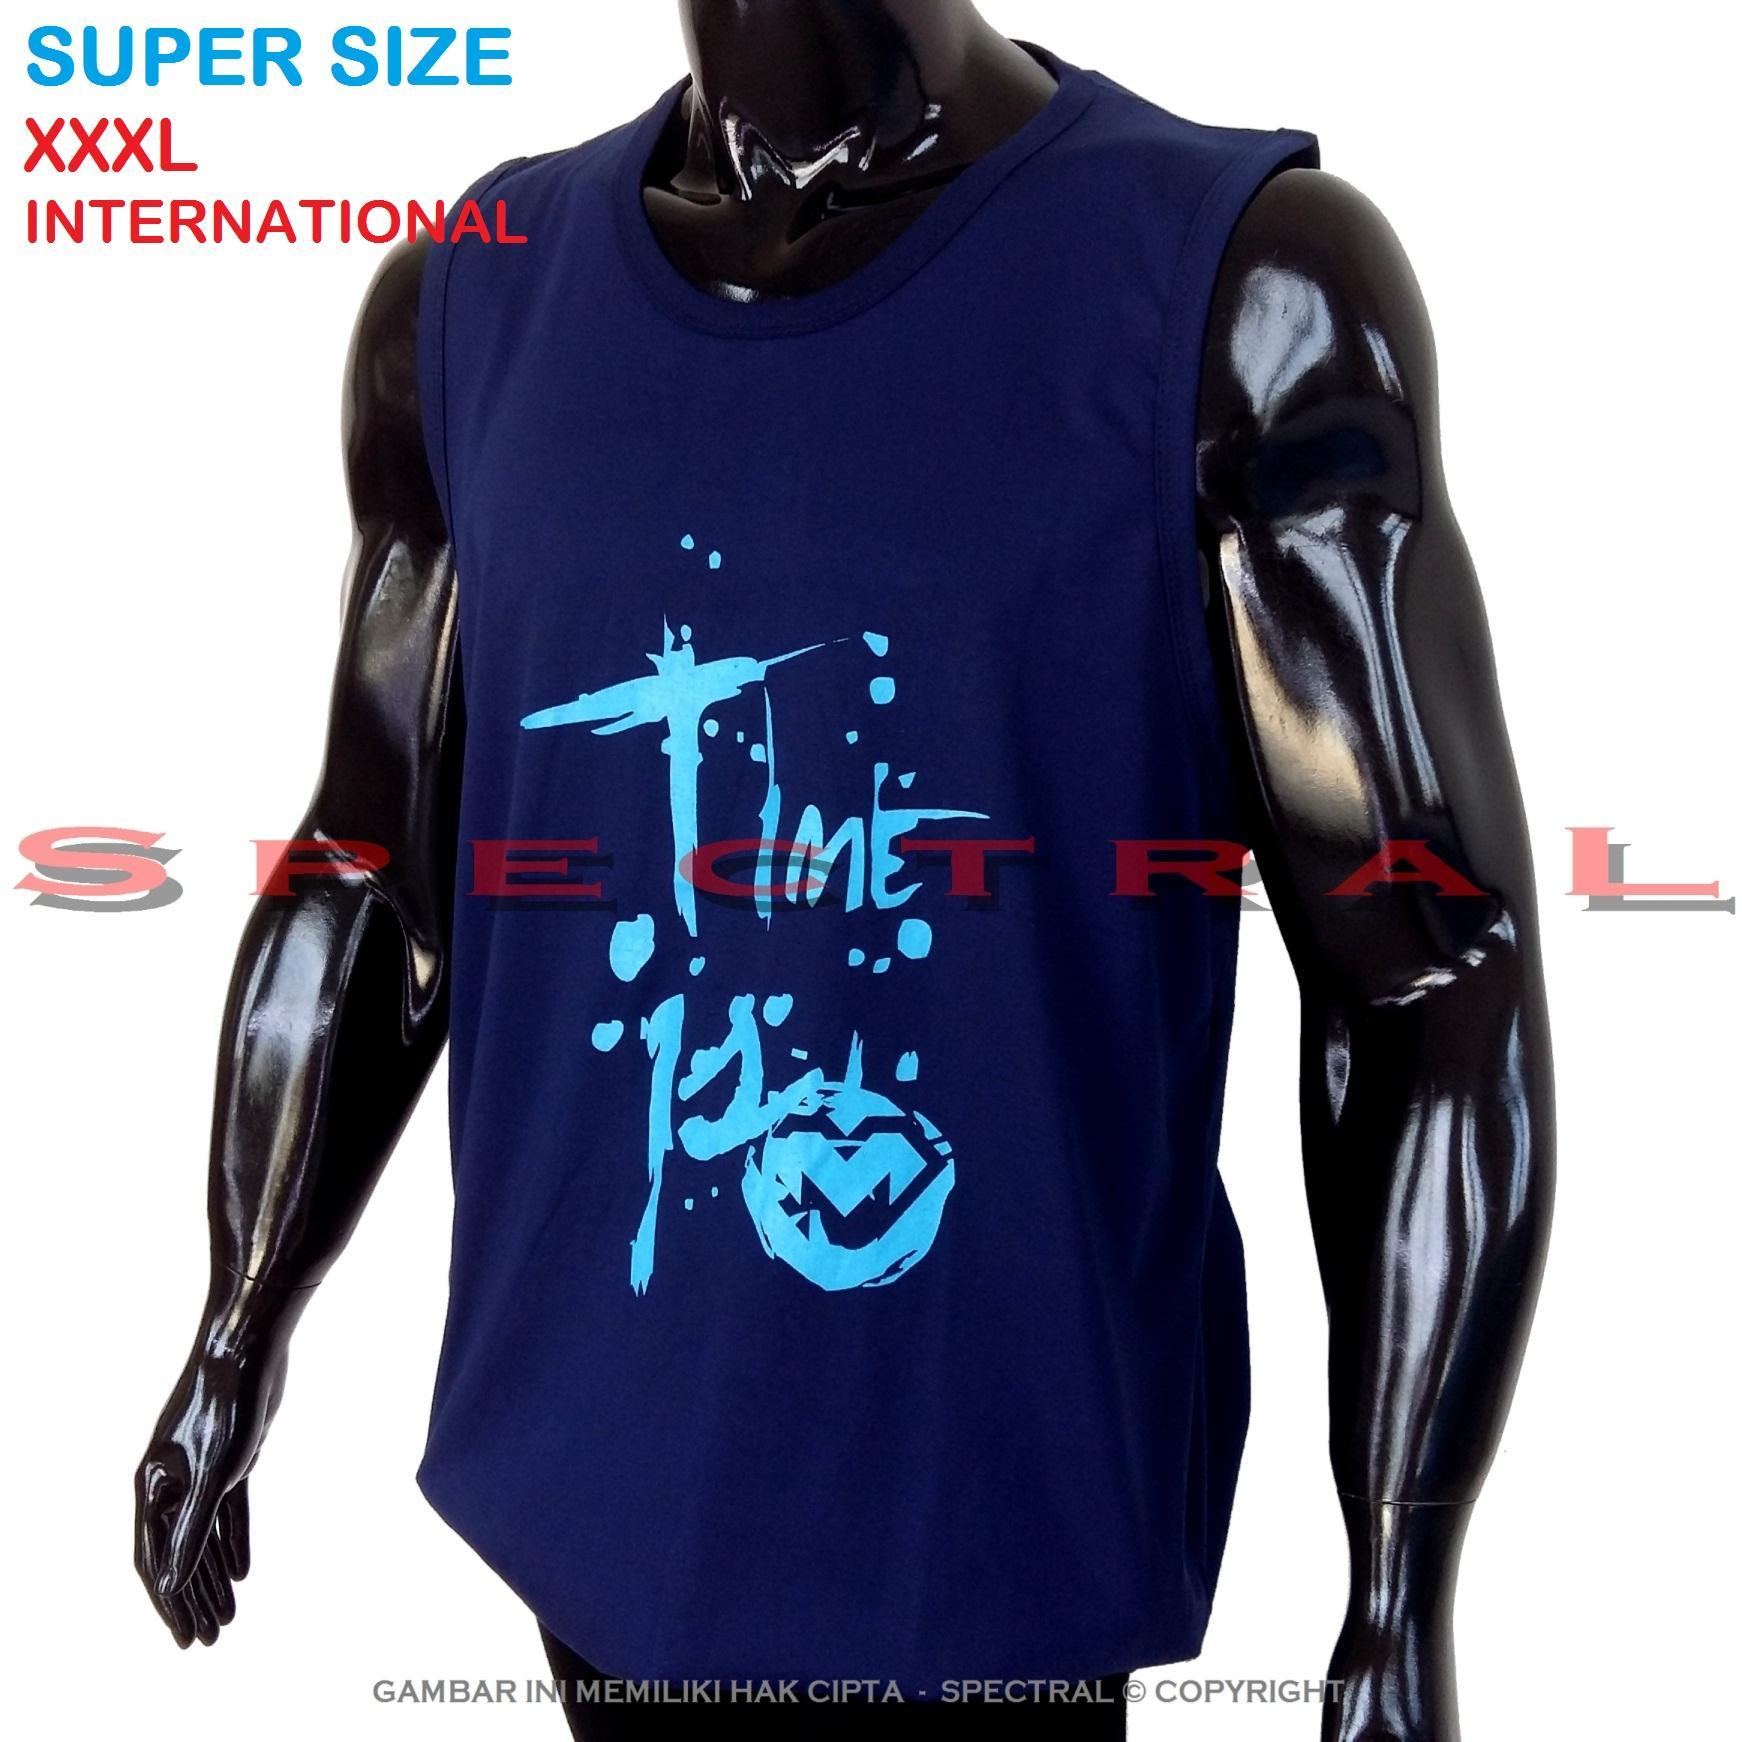 Spectral – 3XL SINGLET SUPER BIG SIZE XXXL 100{55e037da9a70d2f692182bf73e9ad7c46940d20c7297ef2687c837f7bdb7b002} Cotton Combed Kaos Distro Jumbo T-Shirt Fashion Ukuran Besar Polos Celana Olahraga Atasan Pria Wanita Dewasa Bapak Orang Tua Muda Terbaru Gemuk Gendut Sport Bagus Keren Baju Cowo Cewe Pakaian 3L TIME